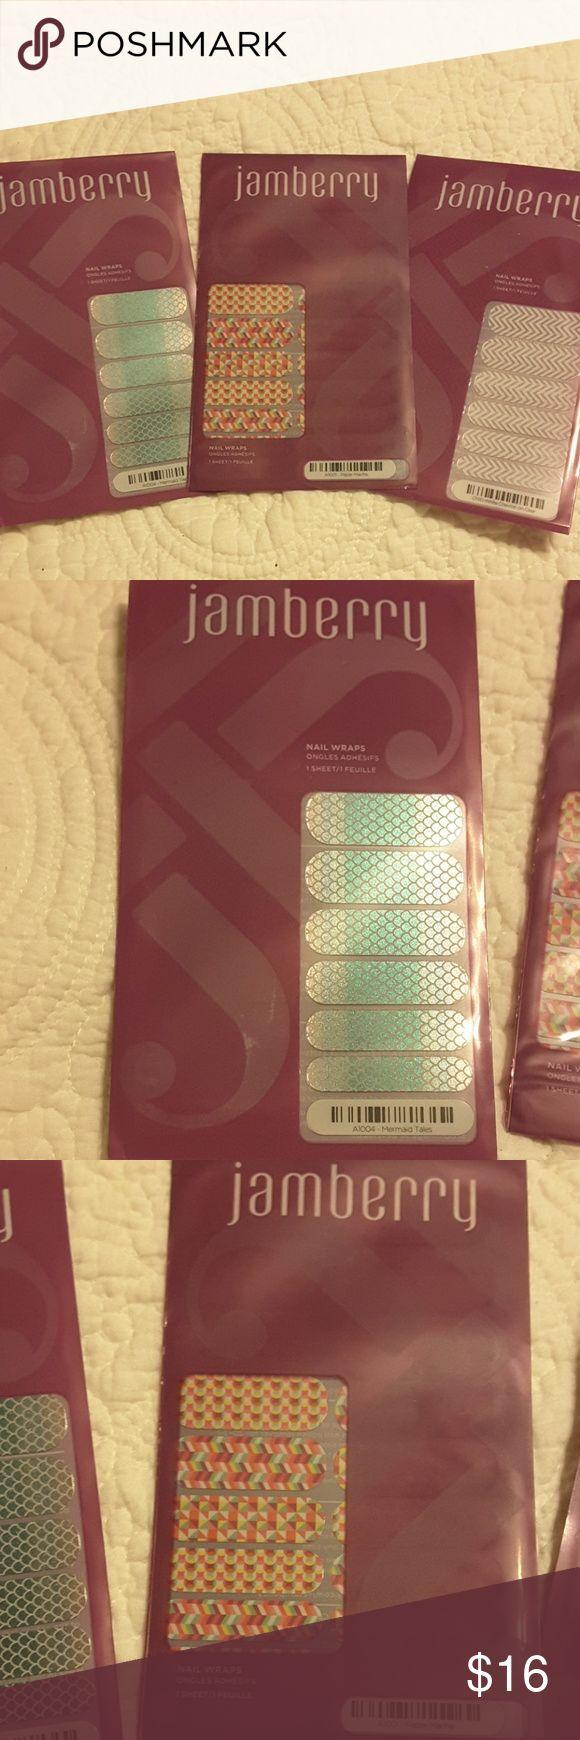 Jamberry nail wraps, 3 packs Jamberry nail wraps Mermaid Tales, Paper Mache, White Chevron on Clear. Jamberry Makeup